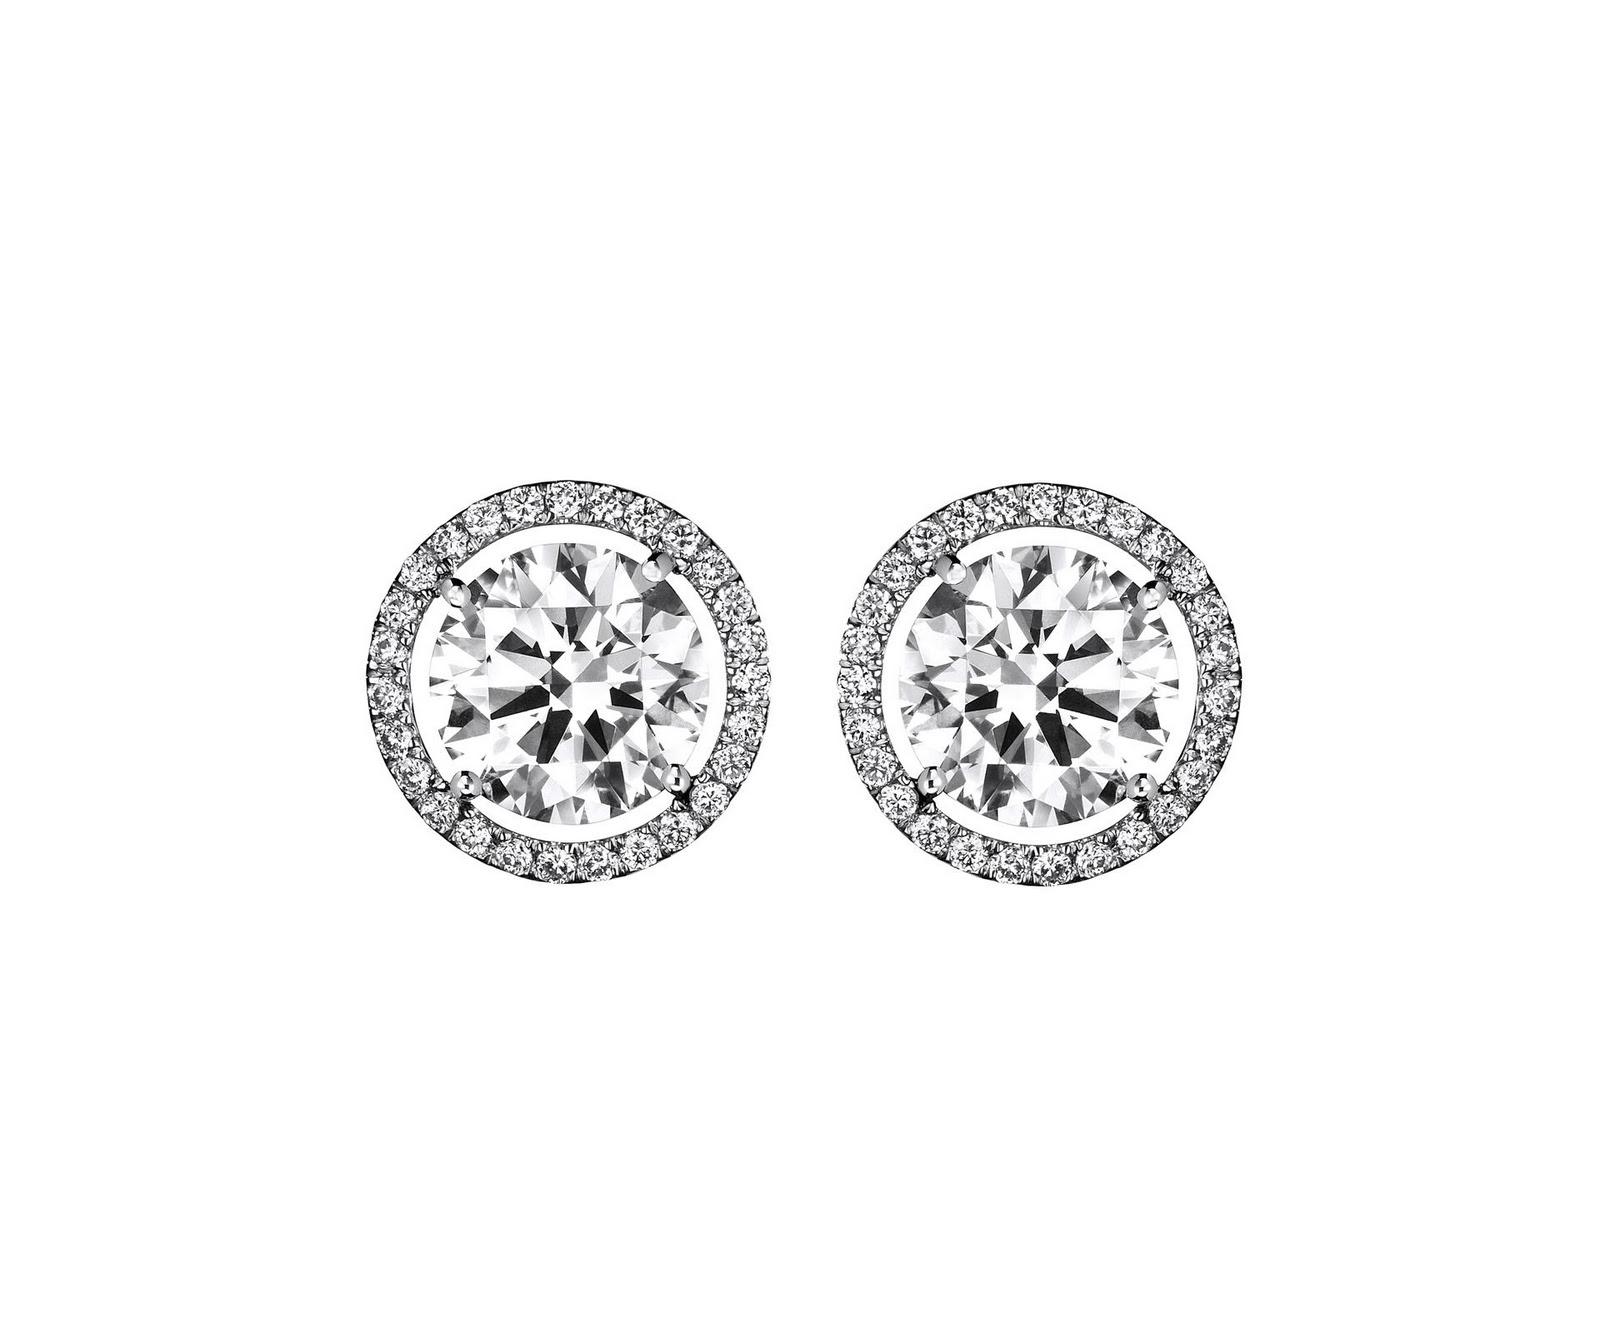 Diamond stud earring clipart download Stud Earrings Cliparts - Cliparts Zone download